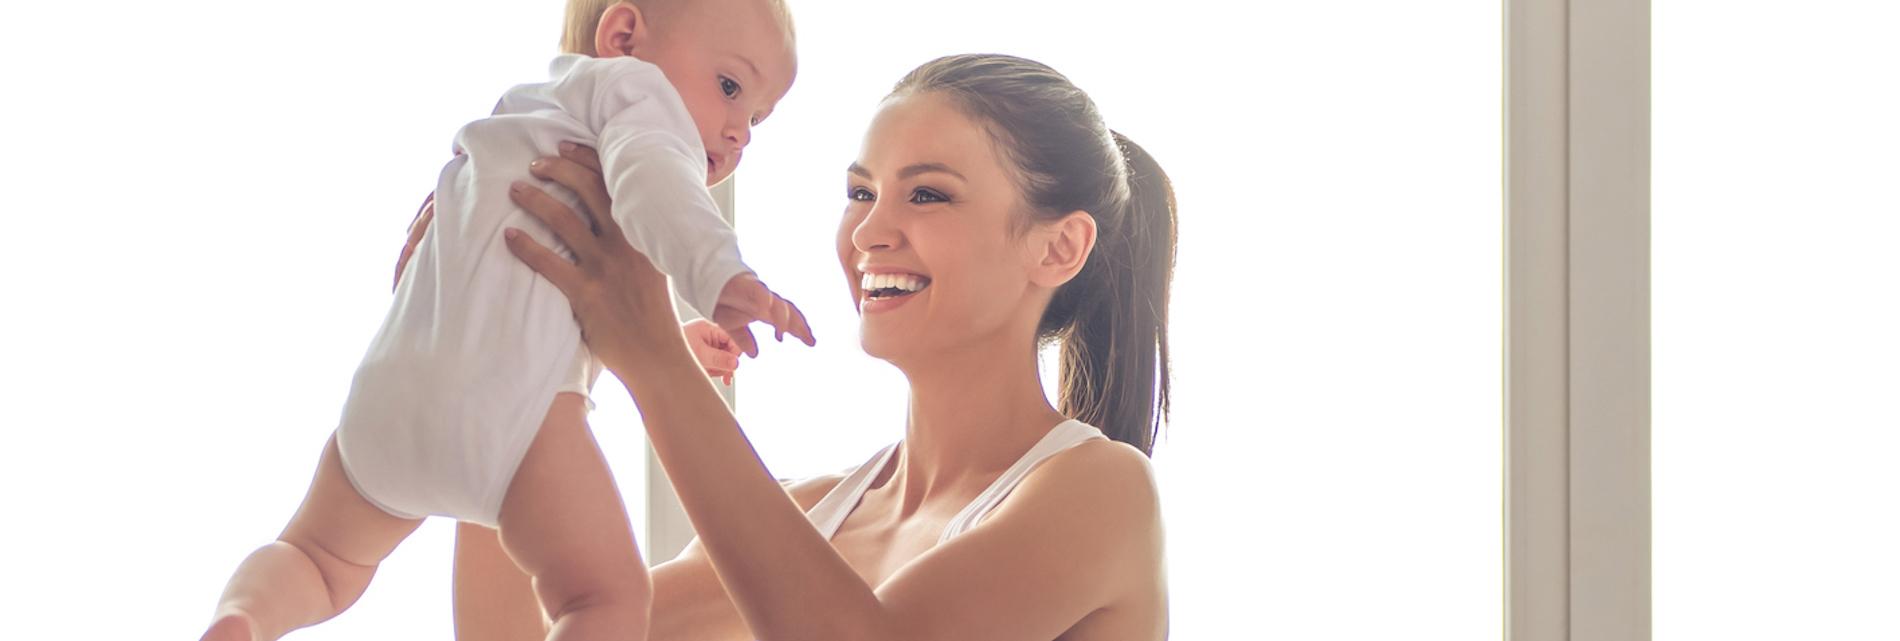 Mother Nurture Network: Toddler & Me